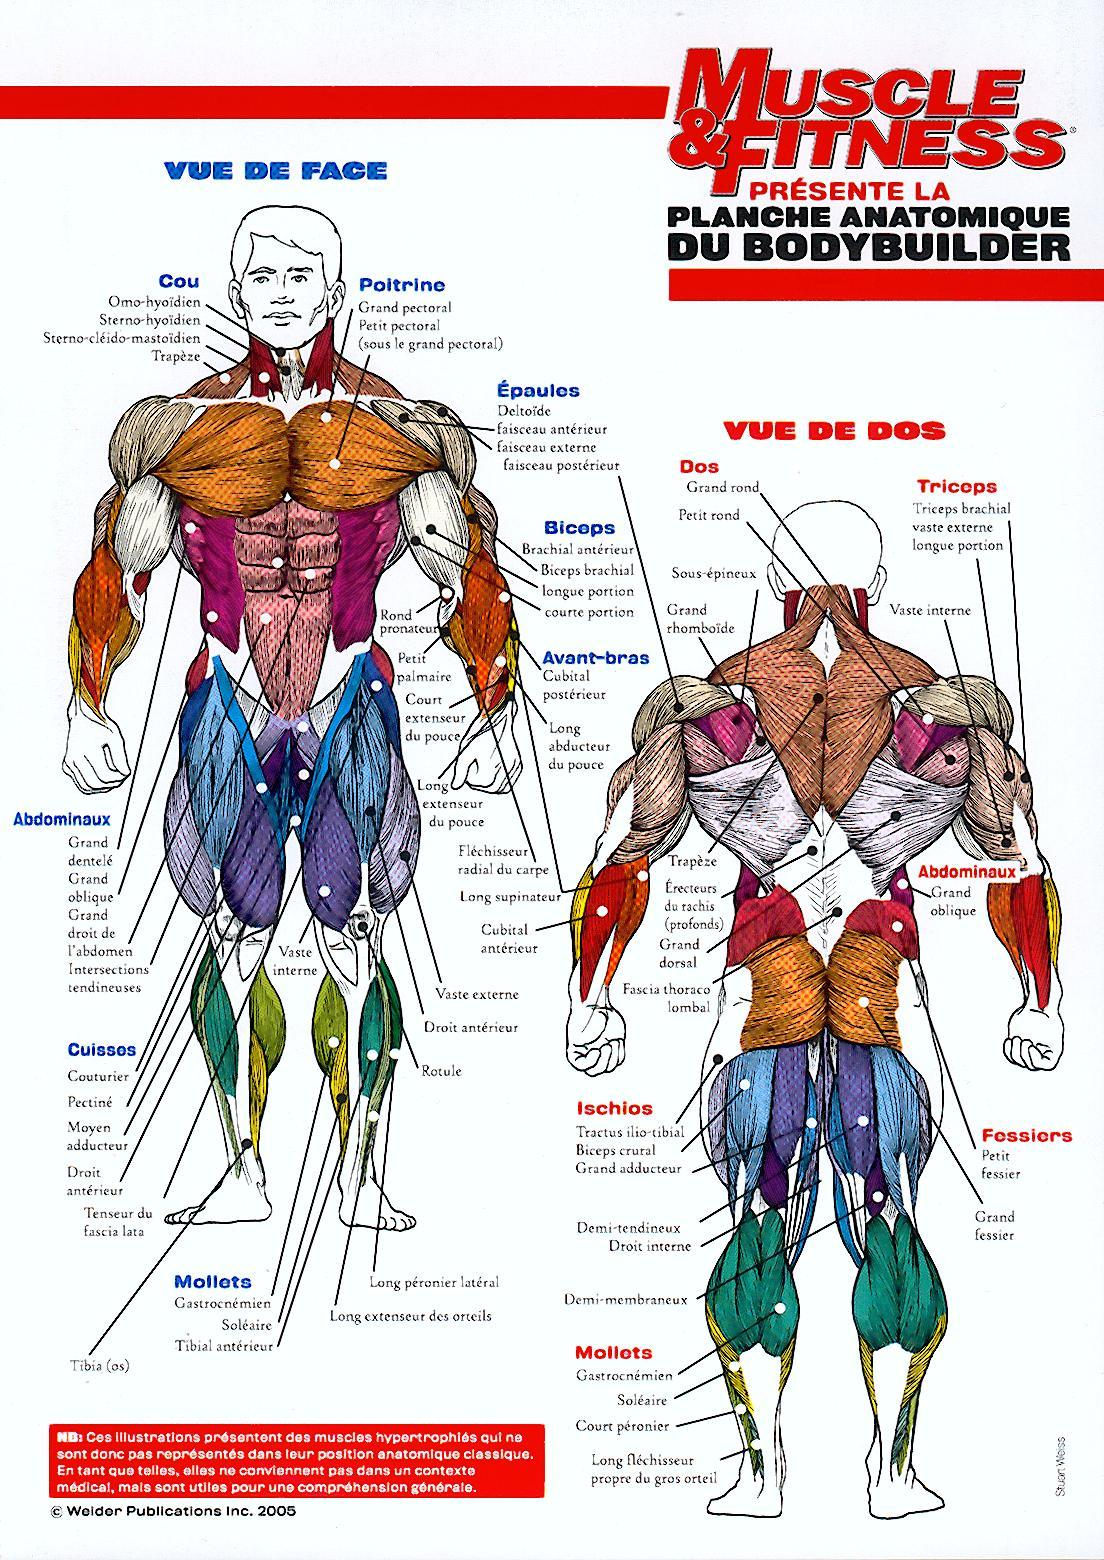 http://ekladata.com/KhdZI0At510NRYxW1WBJlhDaVh4/muscles-planche-anatomique.jpg